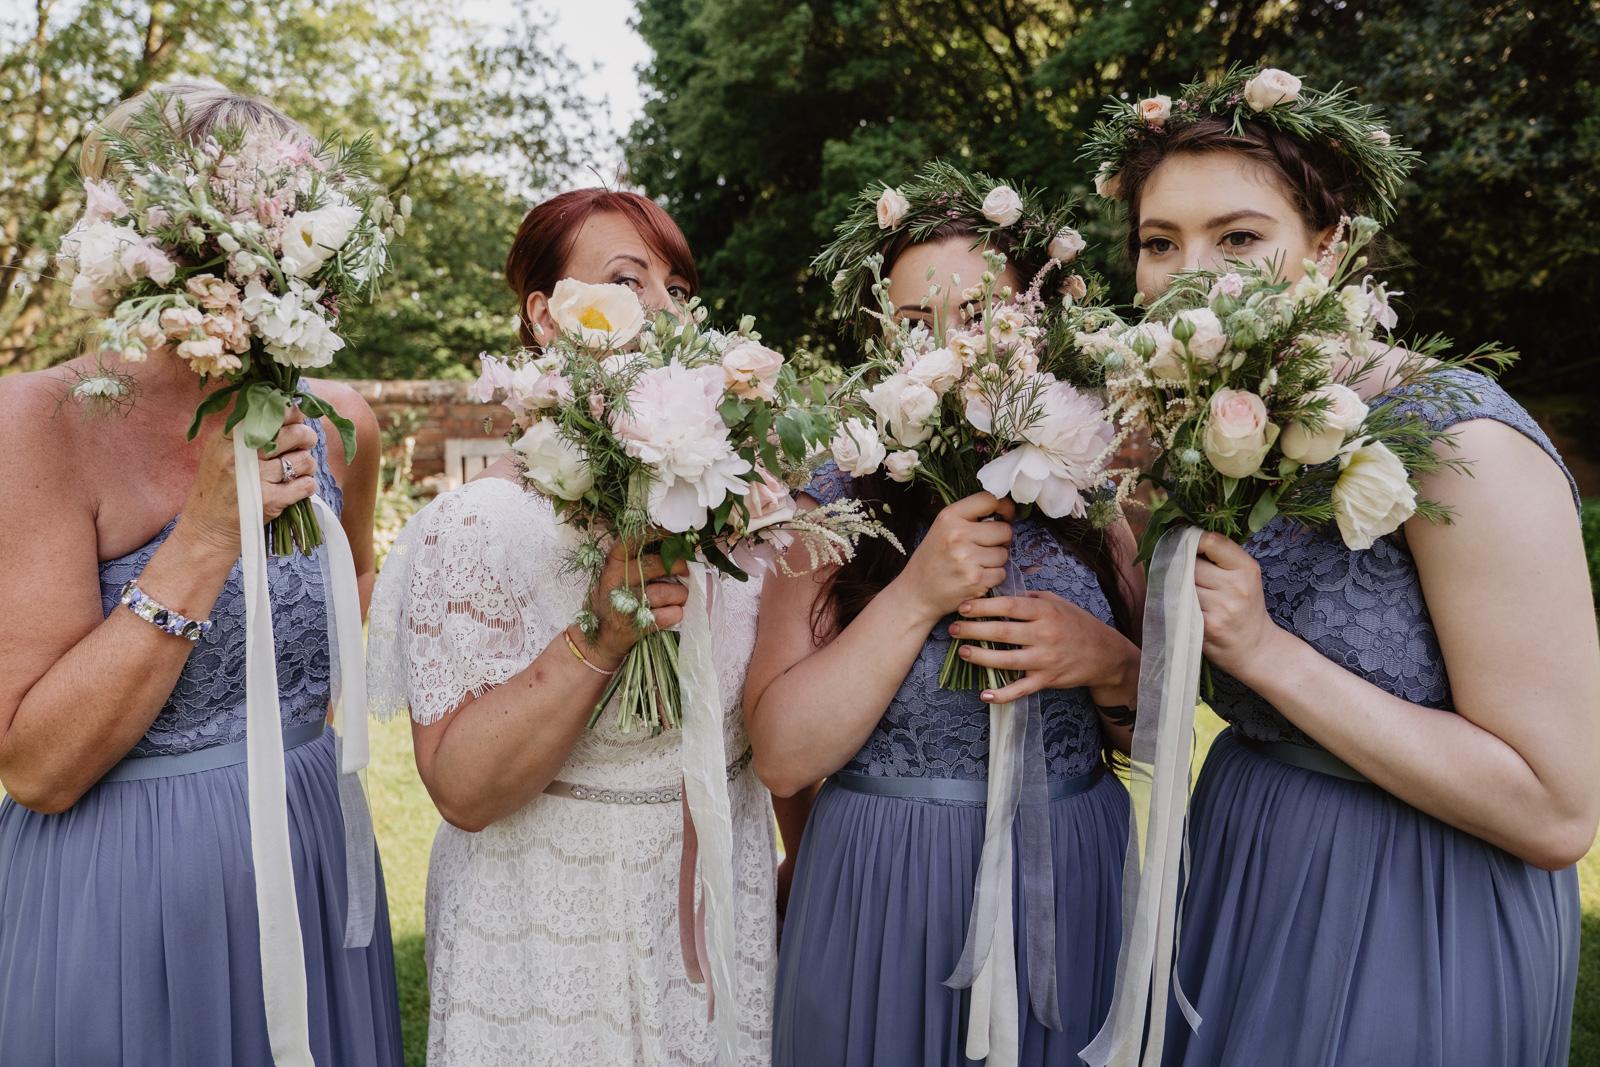 Bridgette-Dahlia-Blush-Silk-Lace-Wedding-Dress-Kate-Beaumont-Sheffield-Ivory-Fayre-6.jpg